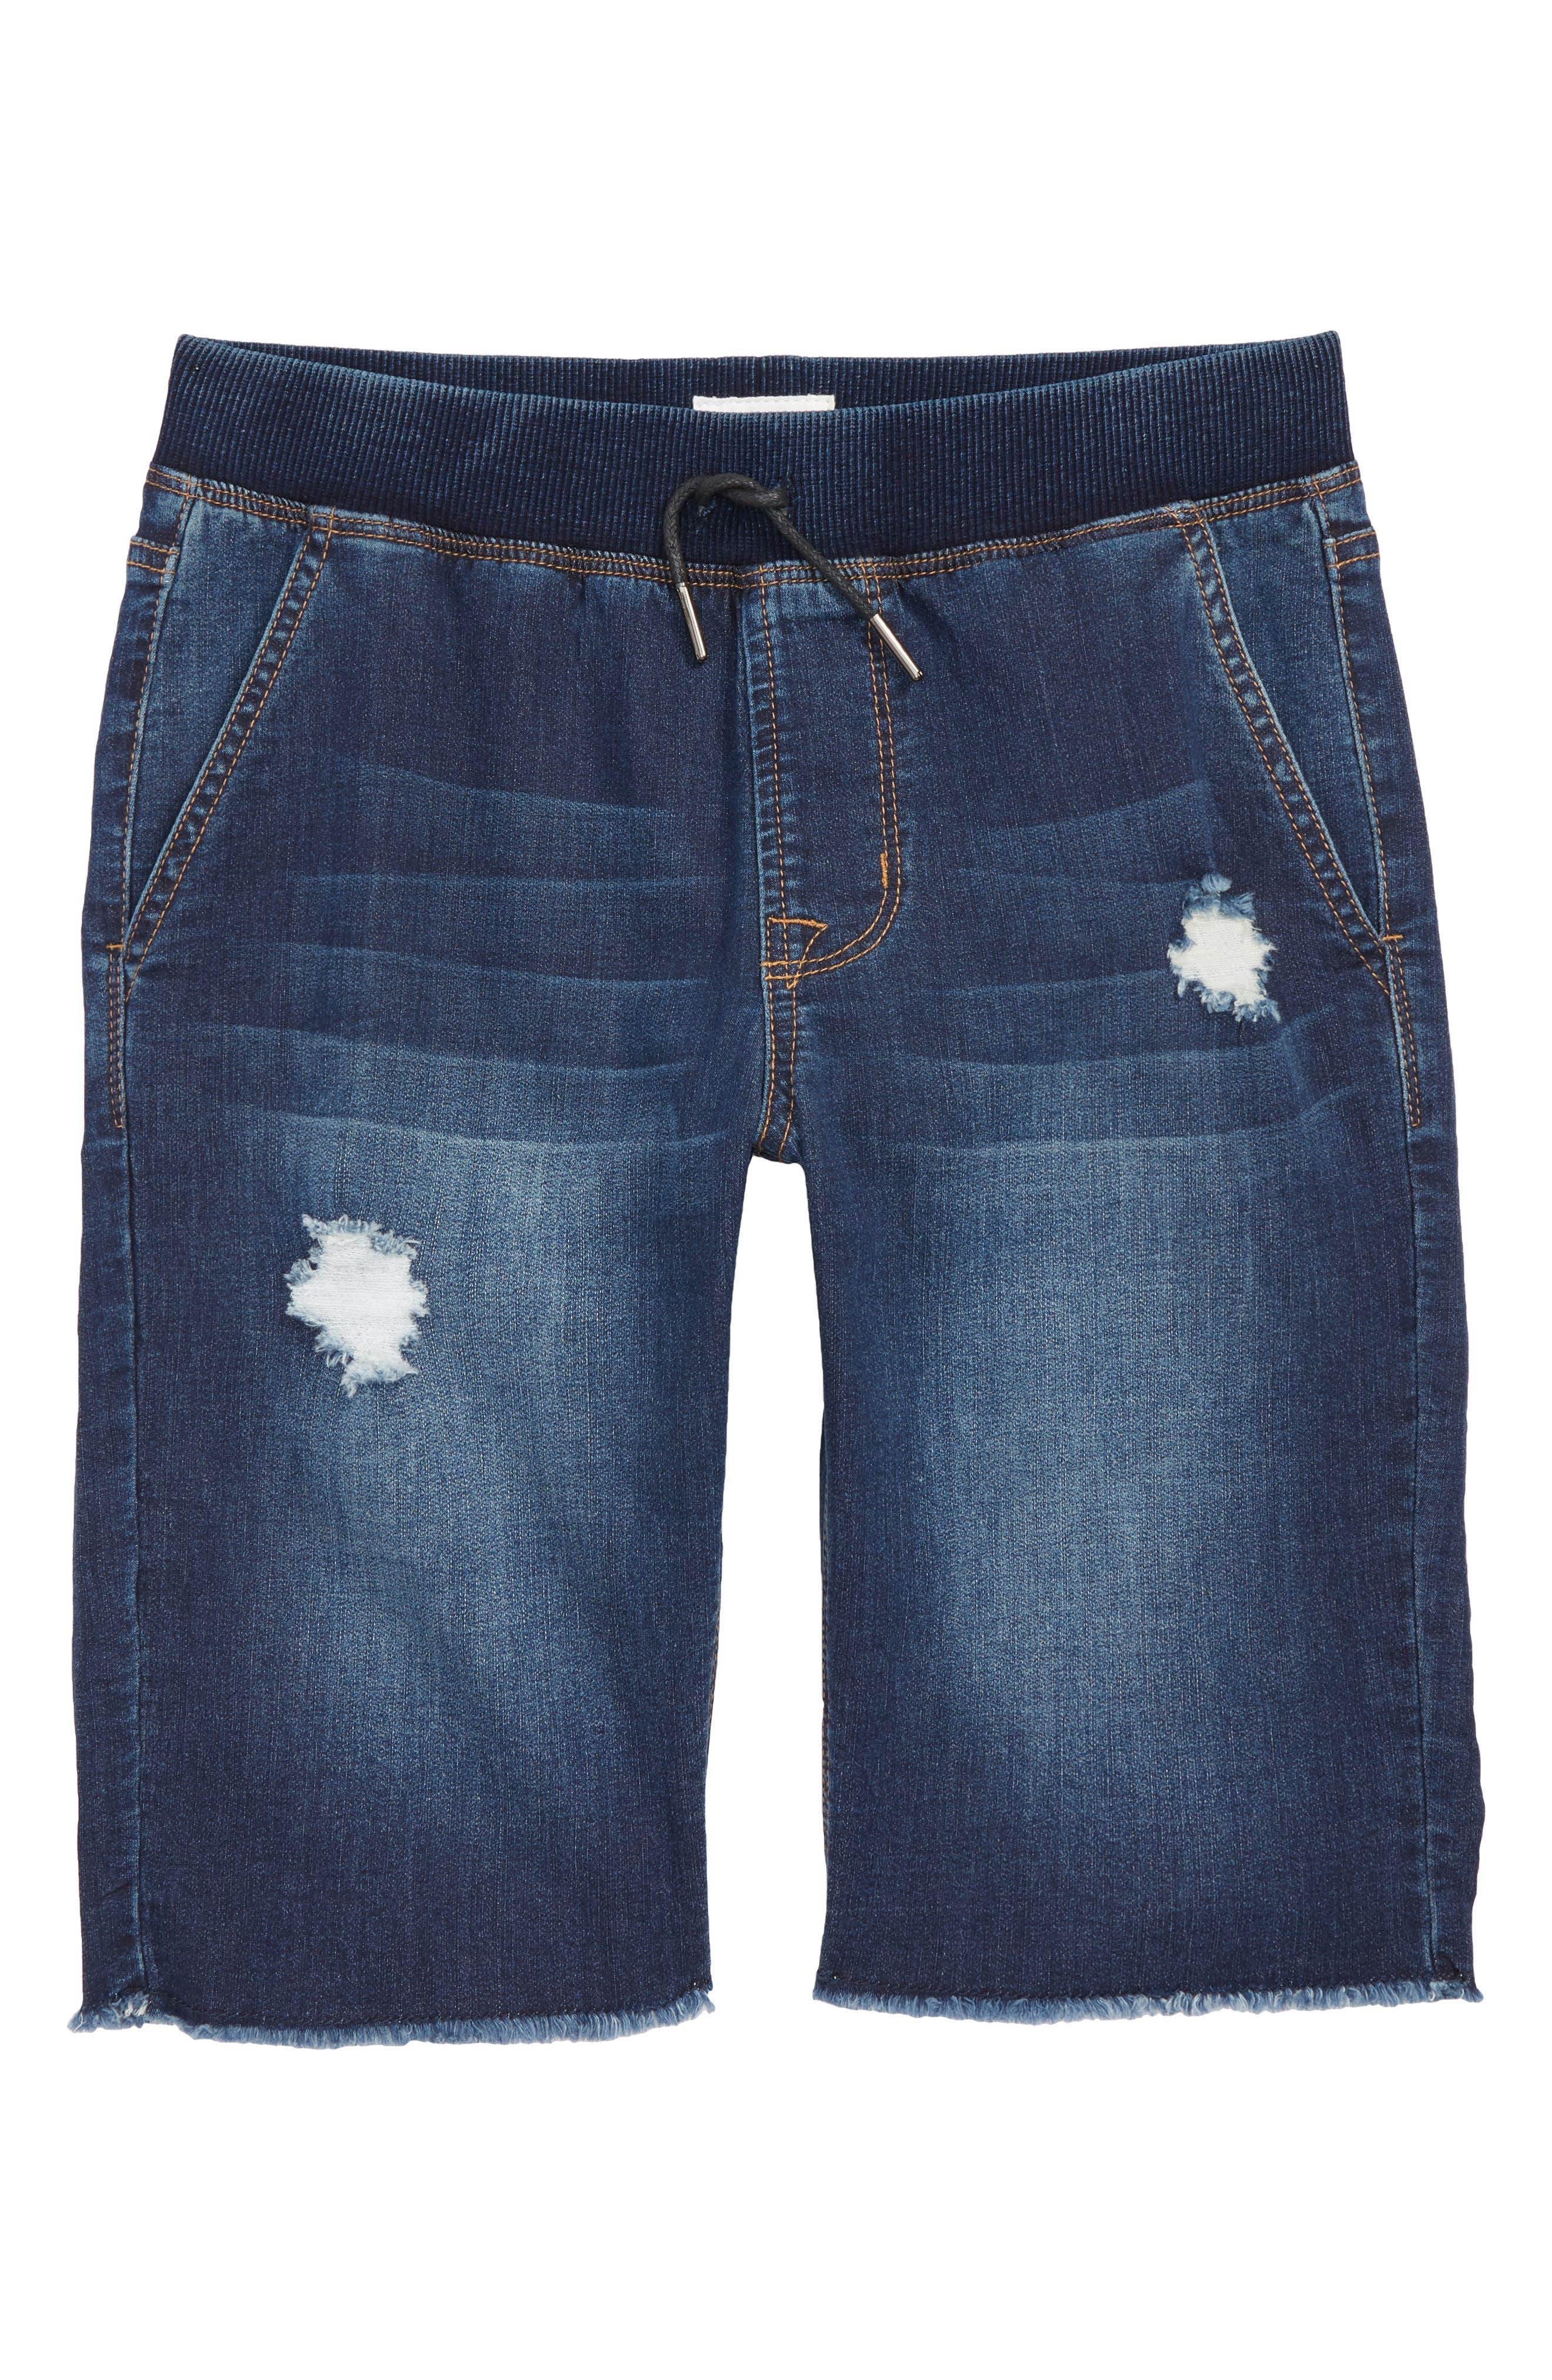 Knit Cutoff Denim Shorts,                         Main,                         color, 481